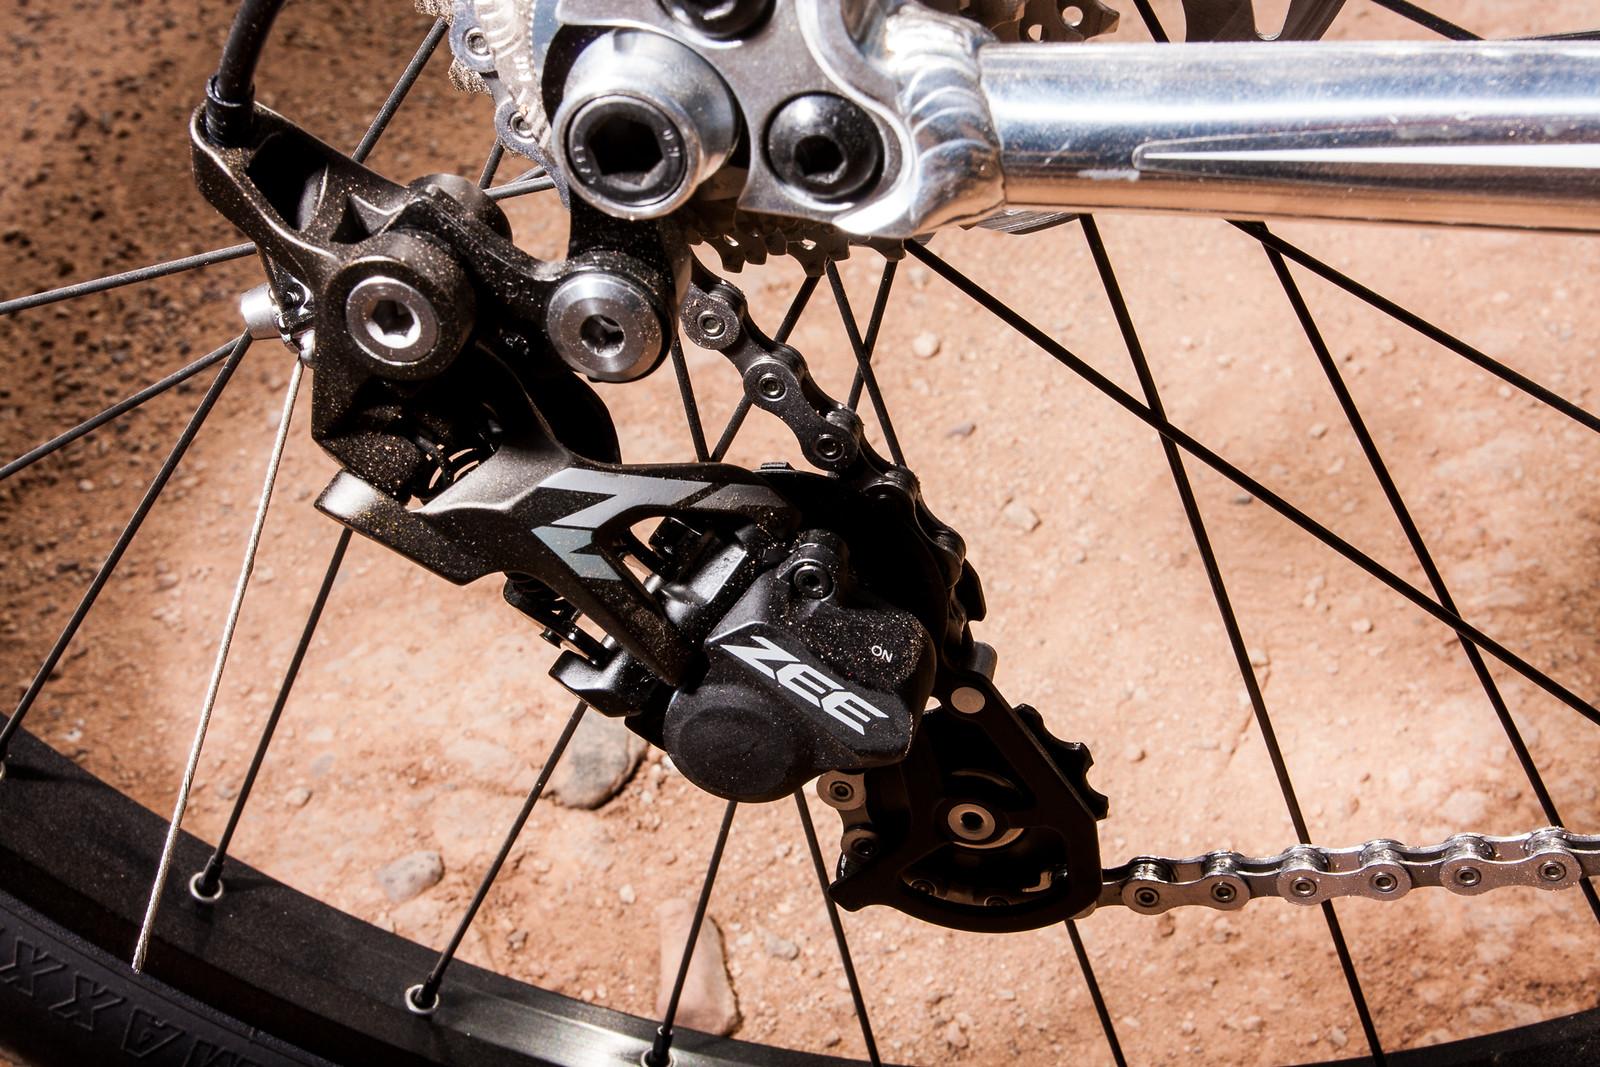 MG 8655 - vickbmx - Mountain Biking Pictures - Vital MTB